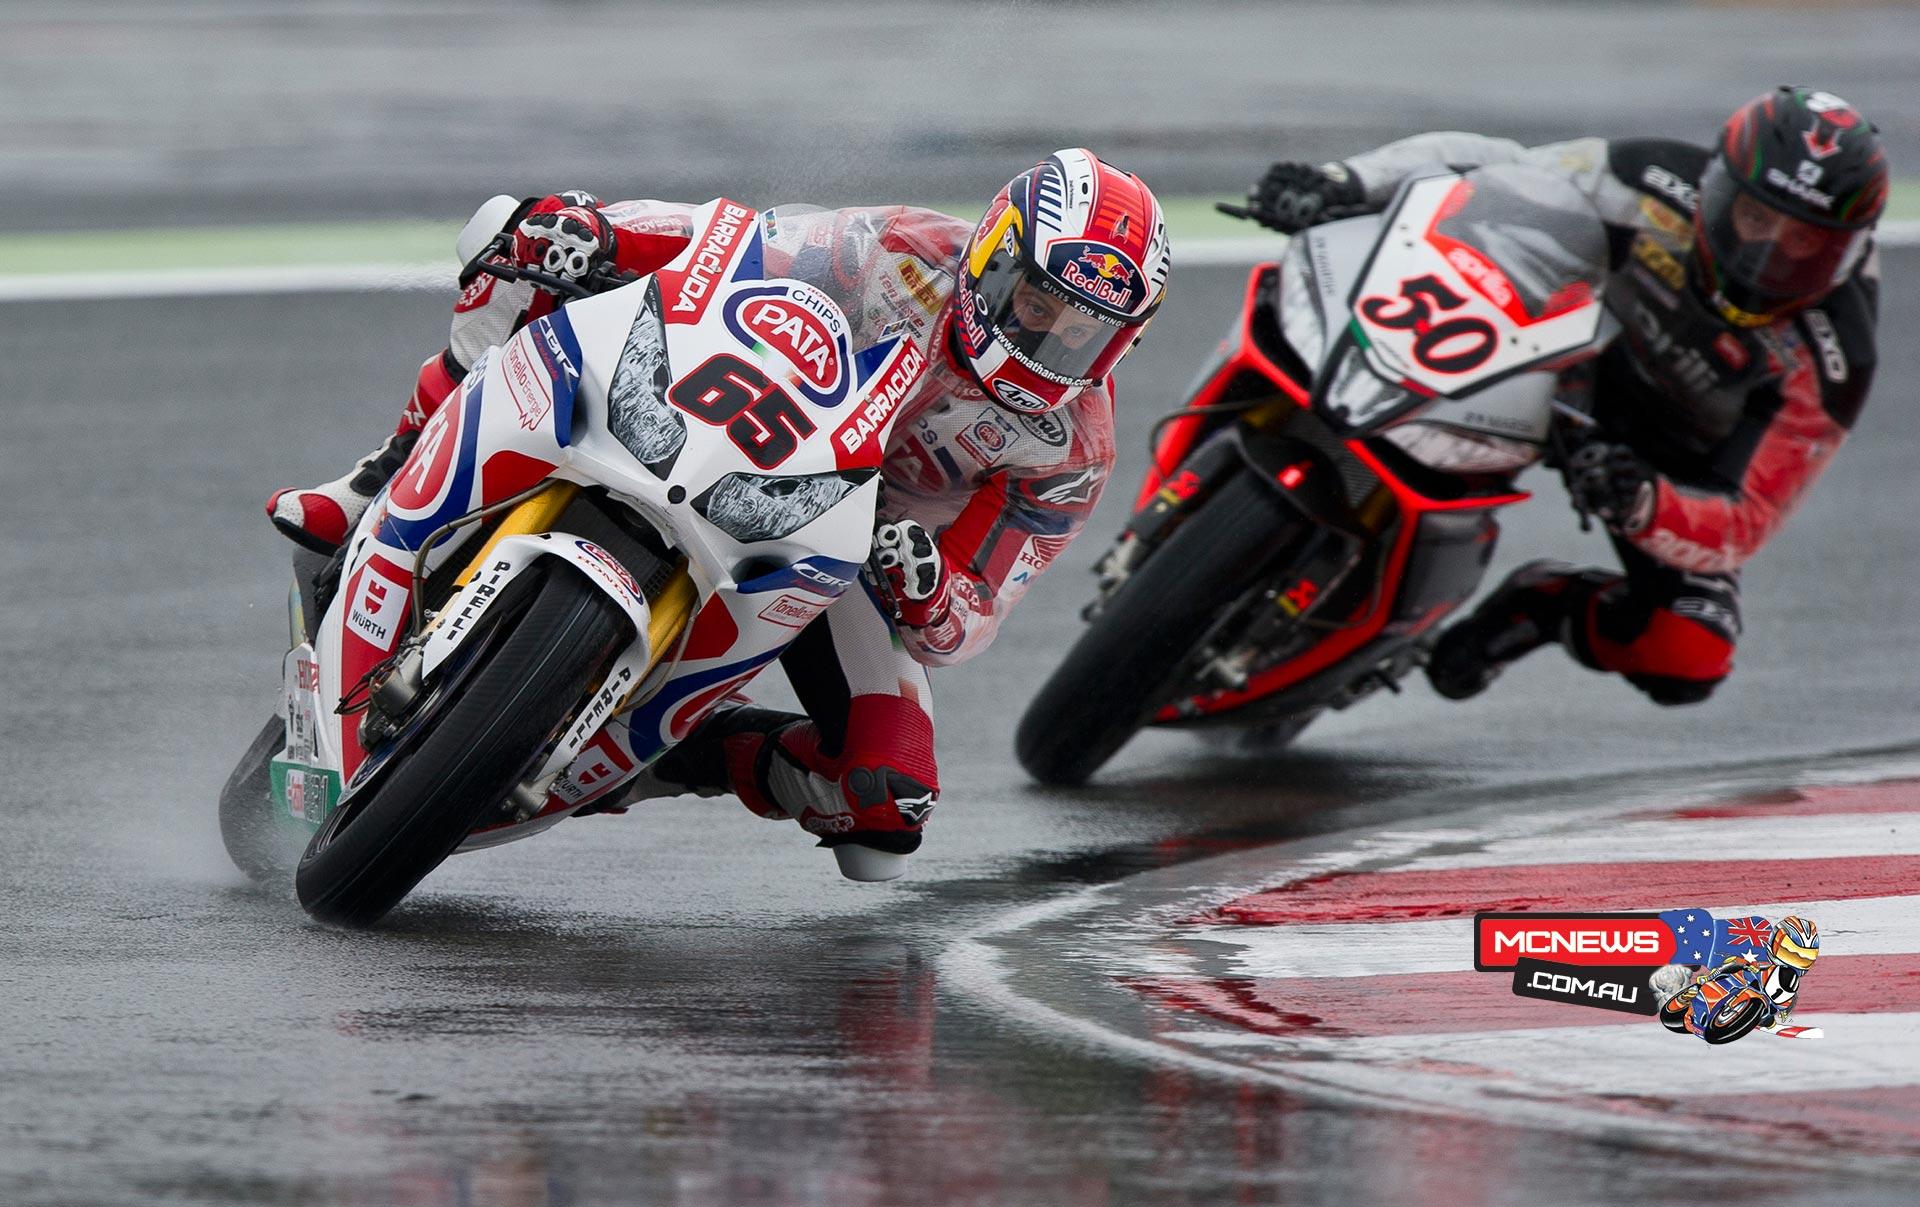 World Superbike Magny-Cours 2014 Jonathan Rea and Sylvain Guintoli